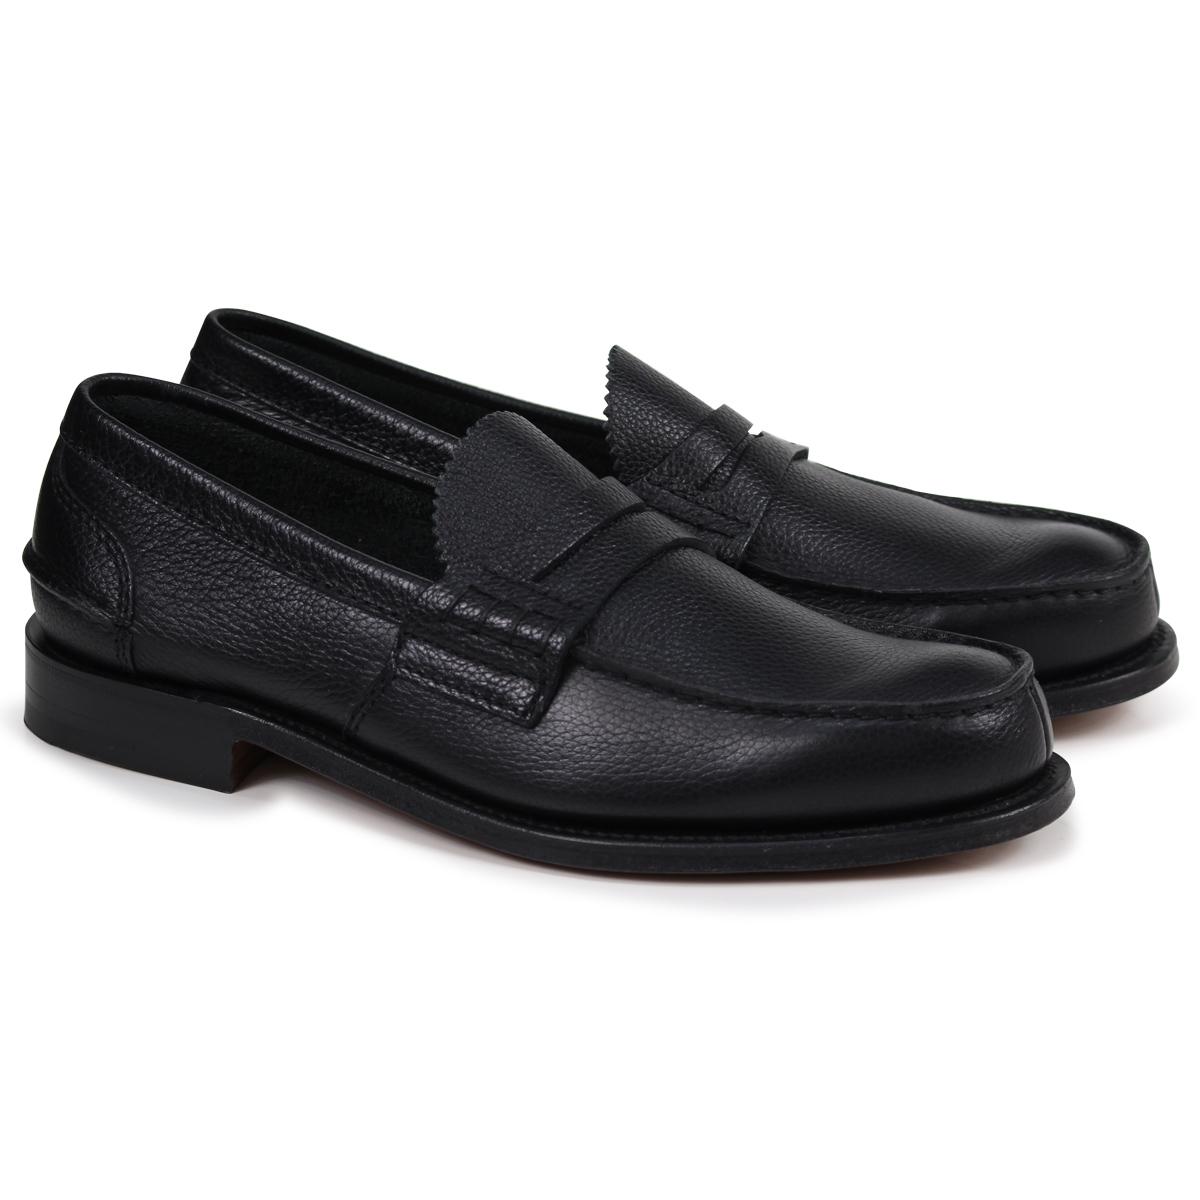 Church's PEMBREY LOAFERS チャーチ 靴 ローファー メンズ ブラック EDB003